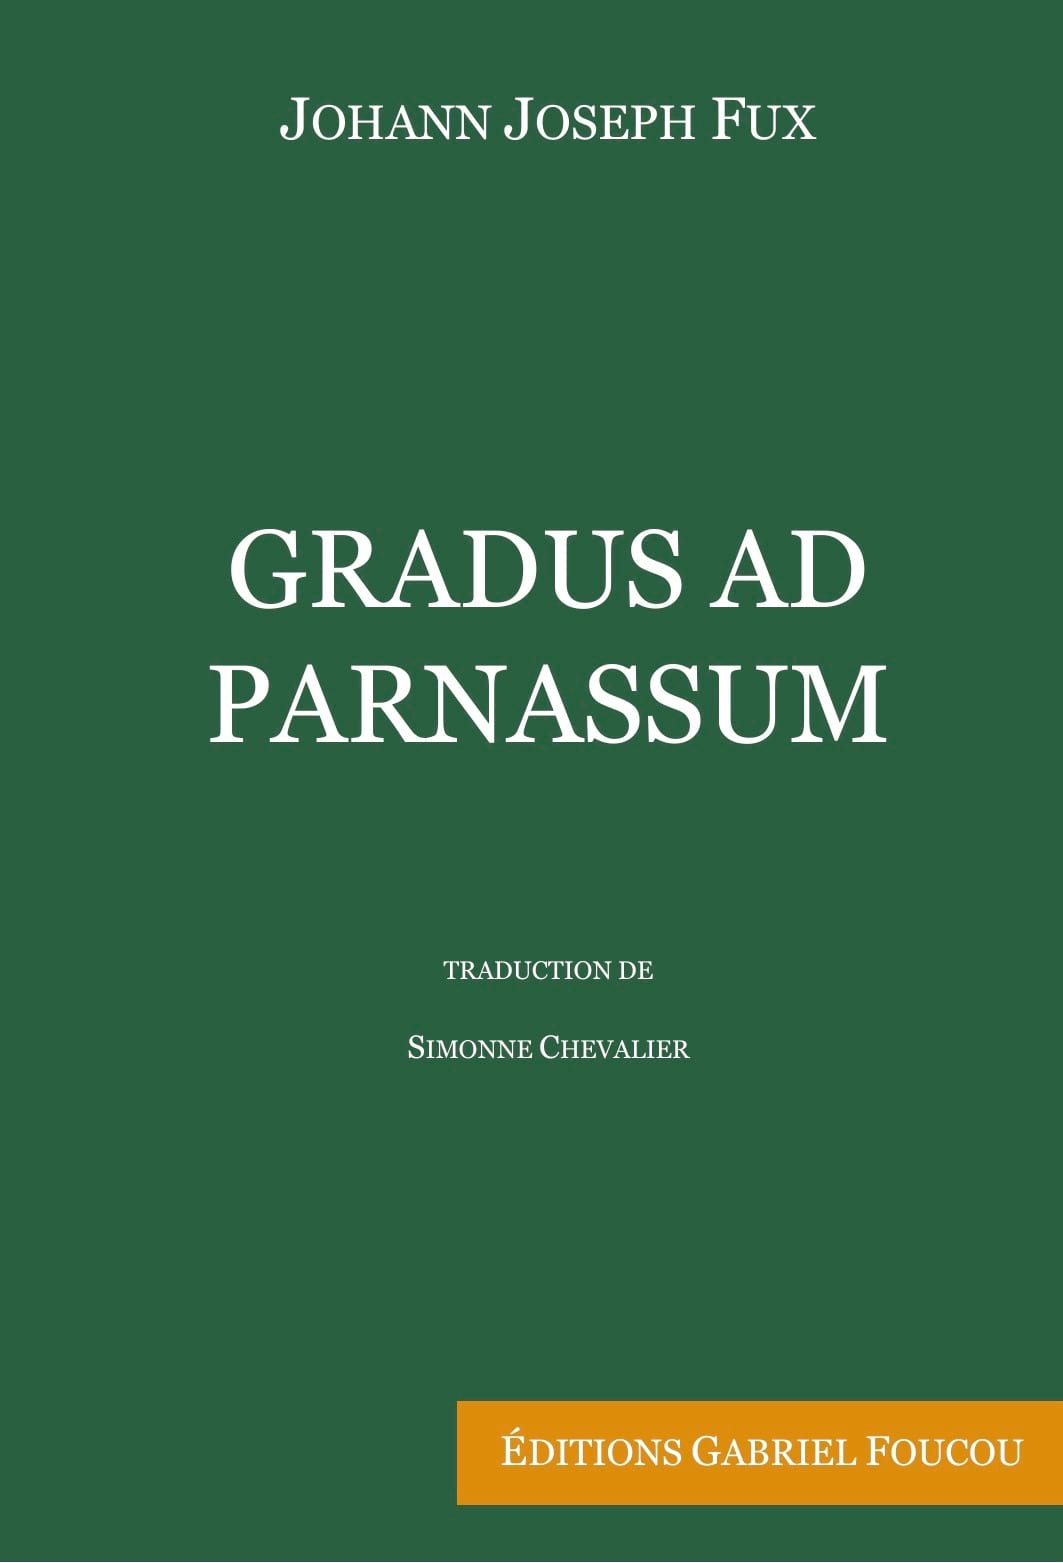 FUX Johann Joseph - Gradus Ad Parnassum - Livre - di-arezzo.de